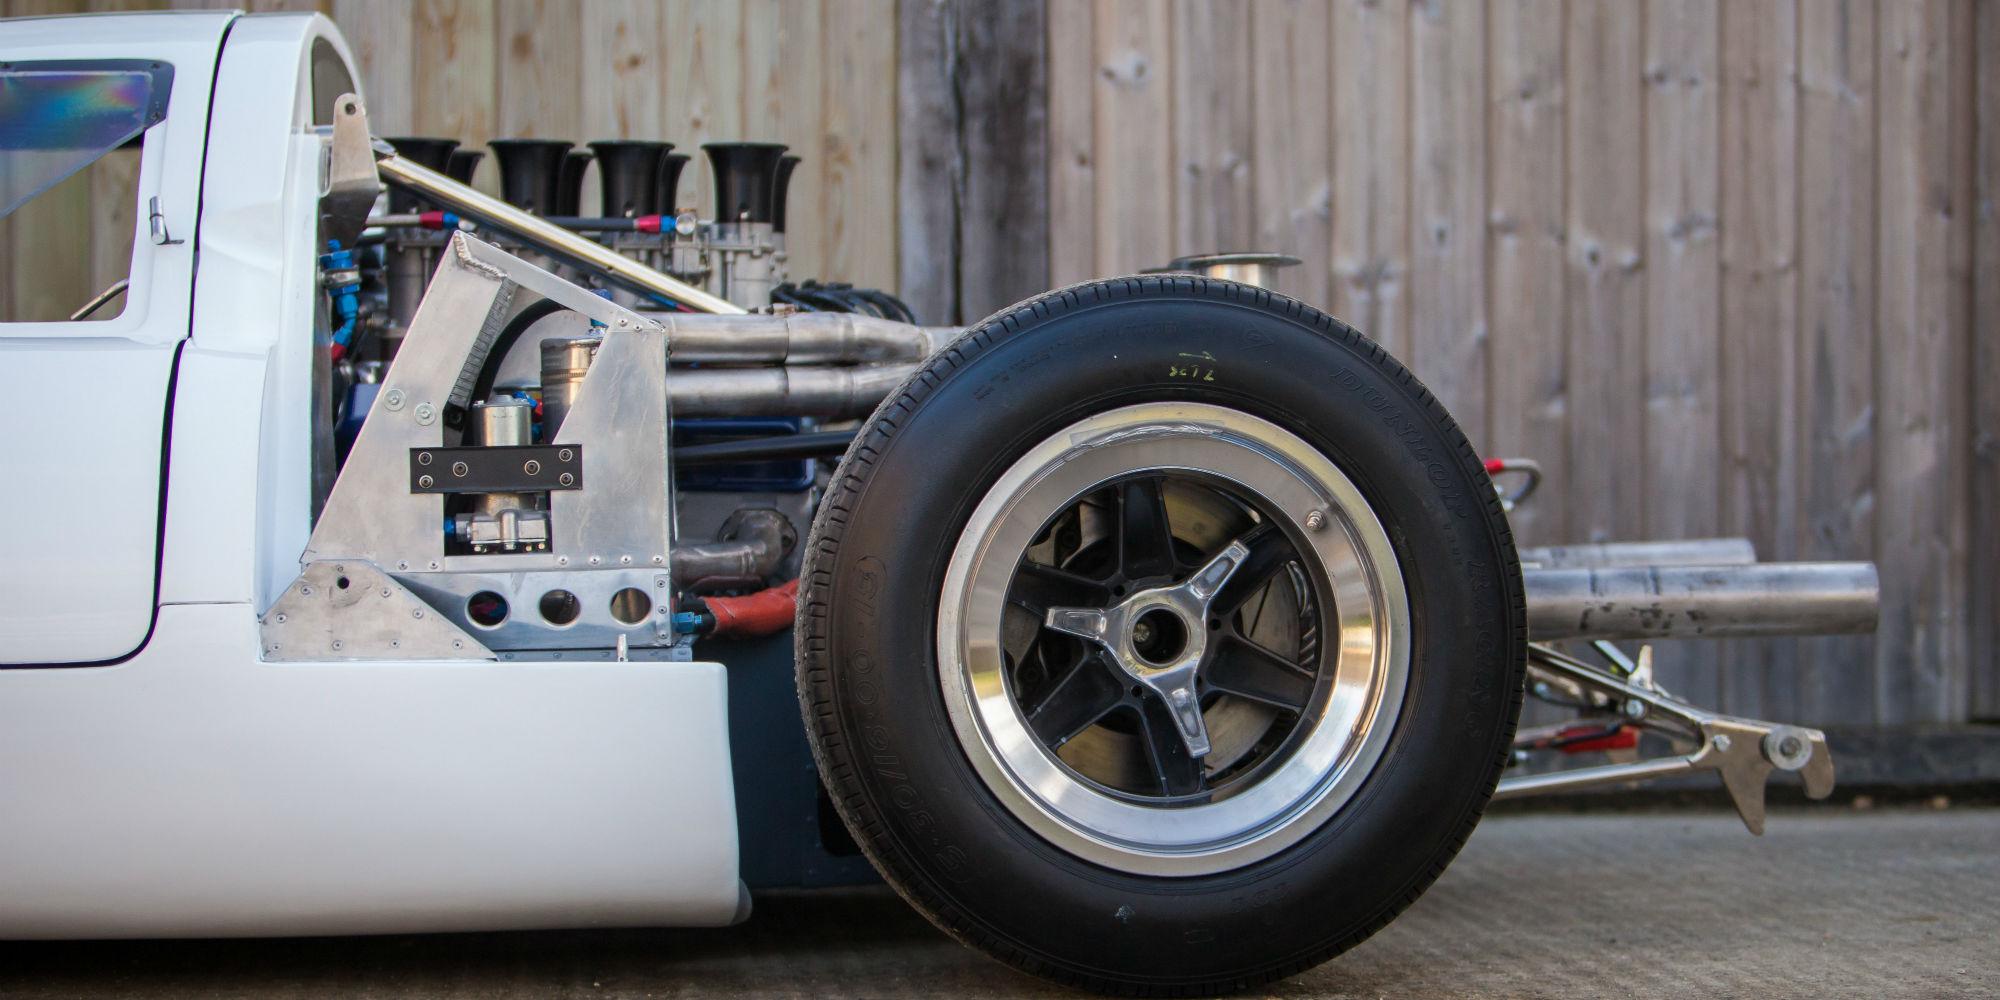 The Sid Taylor Racing, Ex – Redman, Hulme, Gardner, Revson 1969 Lola T70 Mk3B